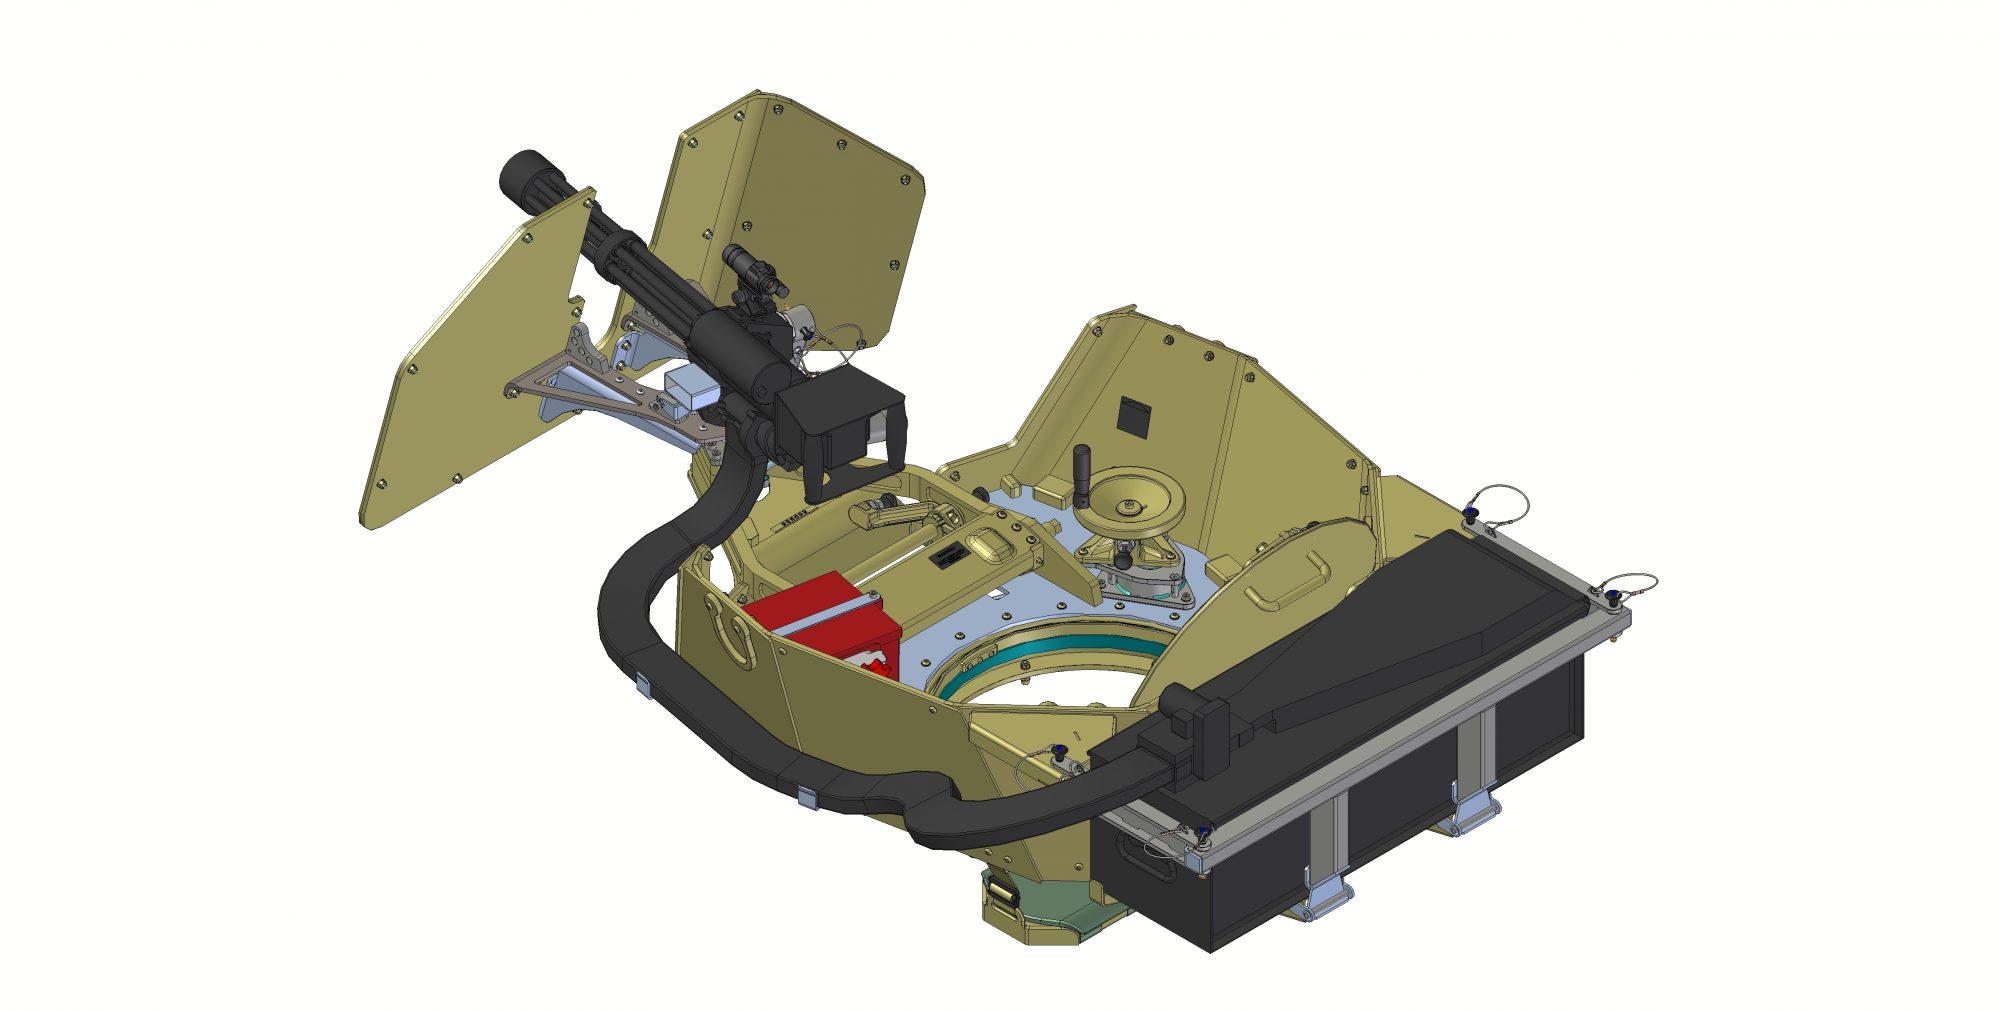 MR550 with manual minigun